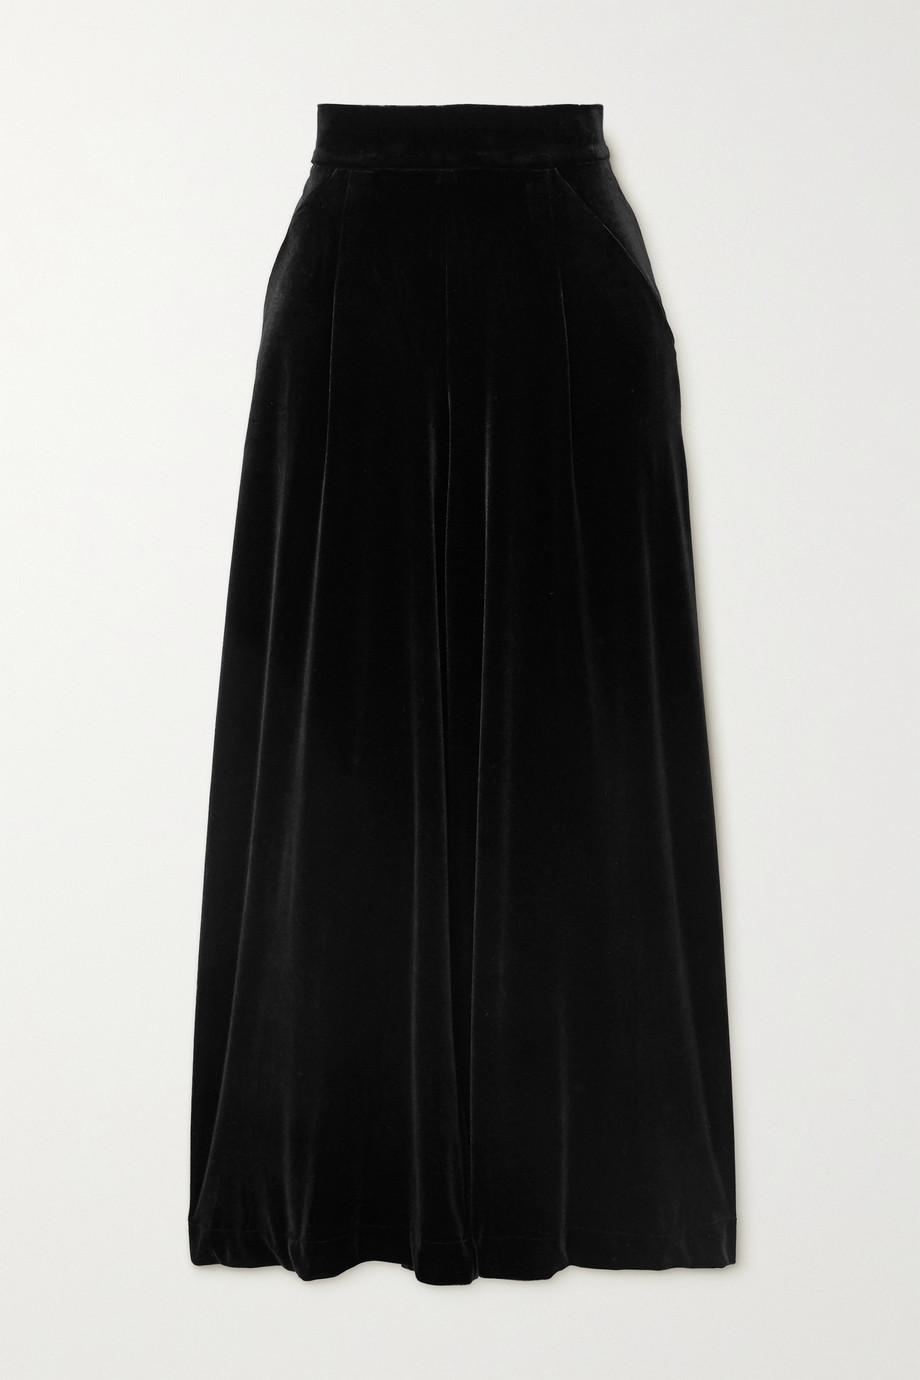 Loretta Caponi Sabrina stretch-velvet wide-leg pants